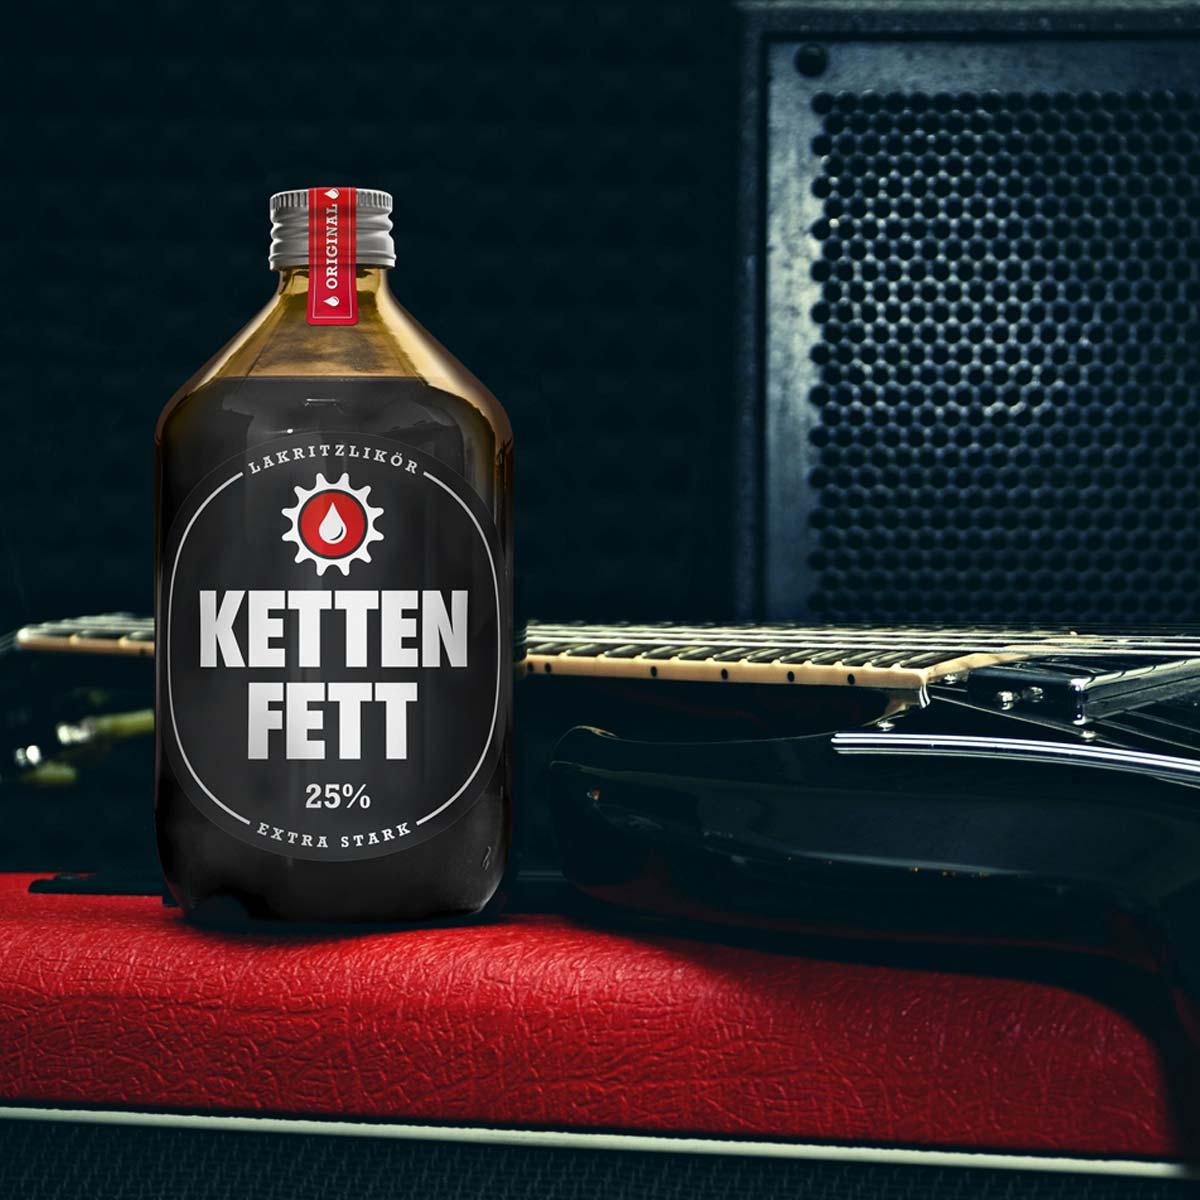 Kettenfett 500ml Kanne/Flasche Gitarre